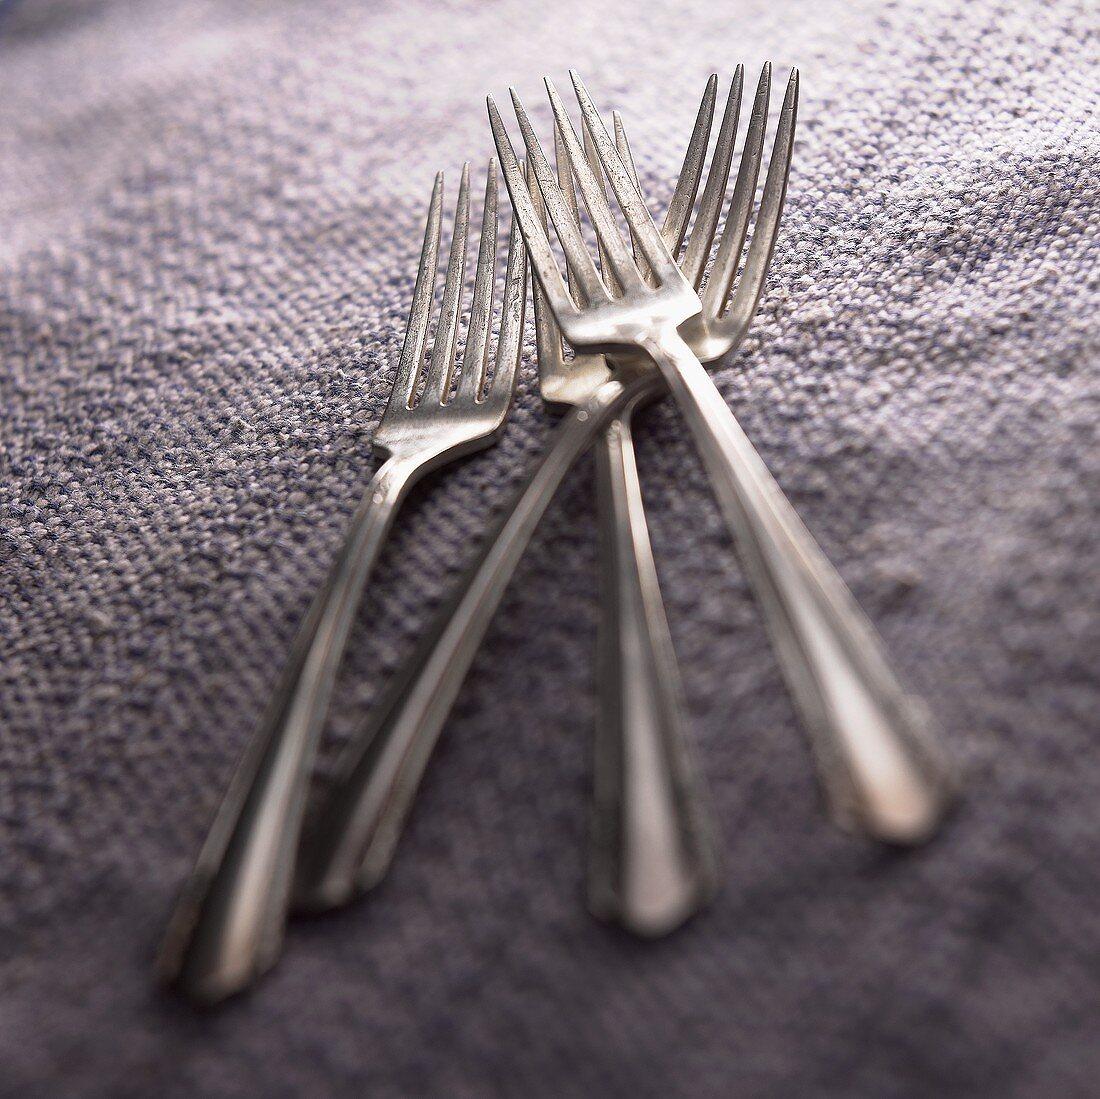 Forks on a Purple Background